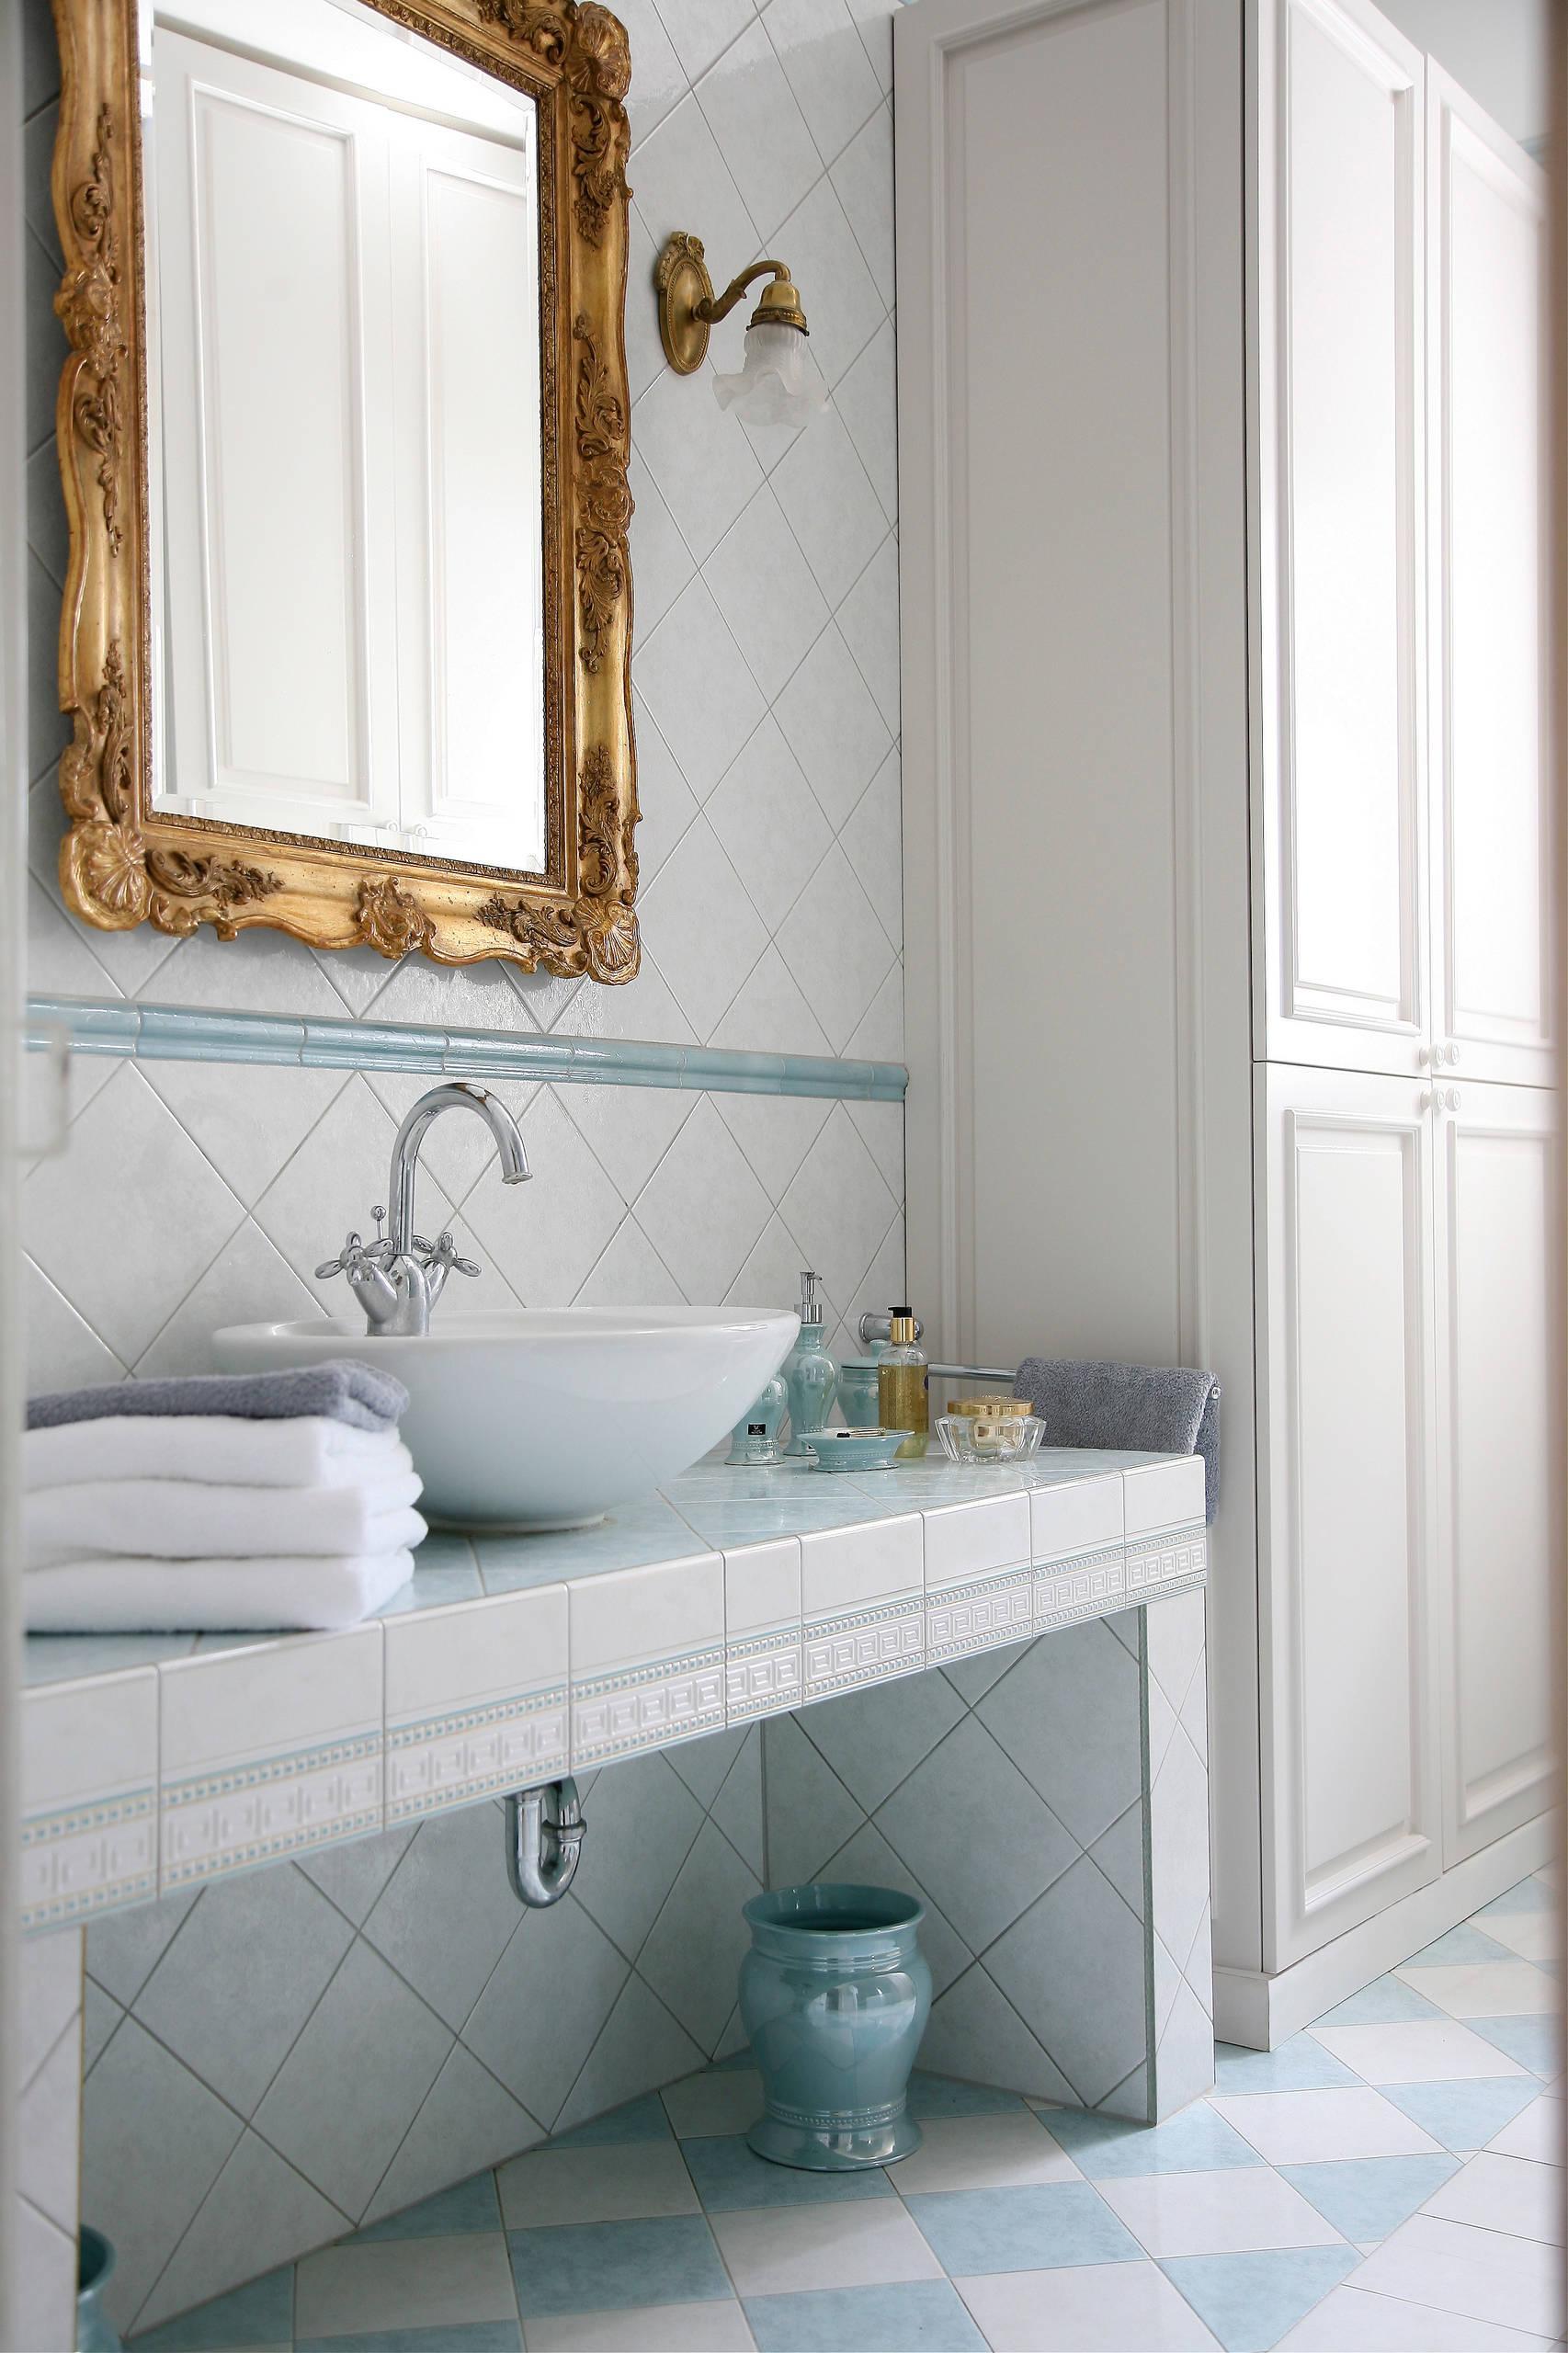 75 Beautiful Victorian Ceramic Tile Bath Pictures Ideas February 2021 Houzz